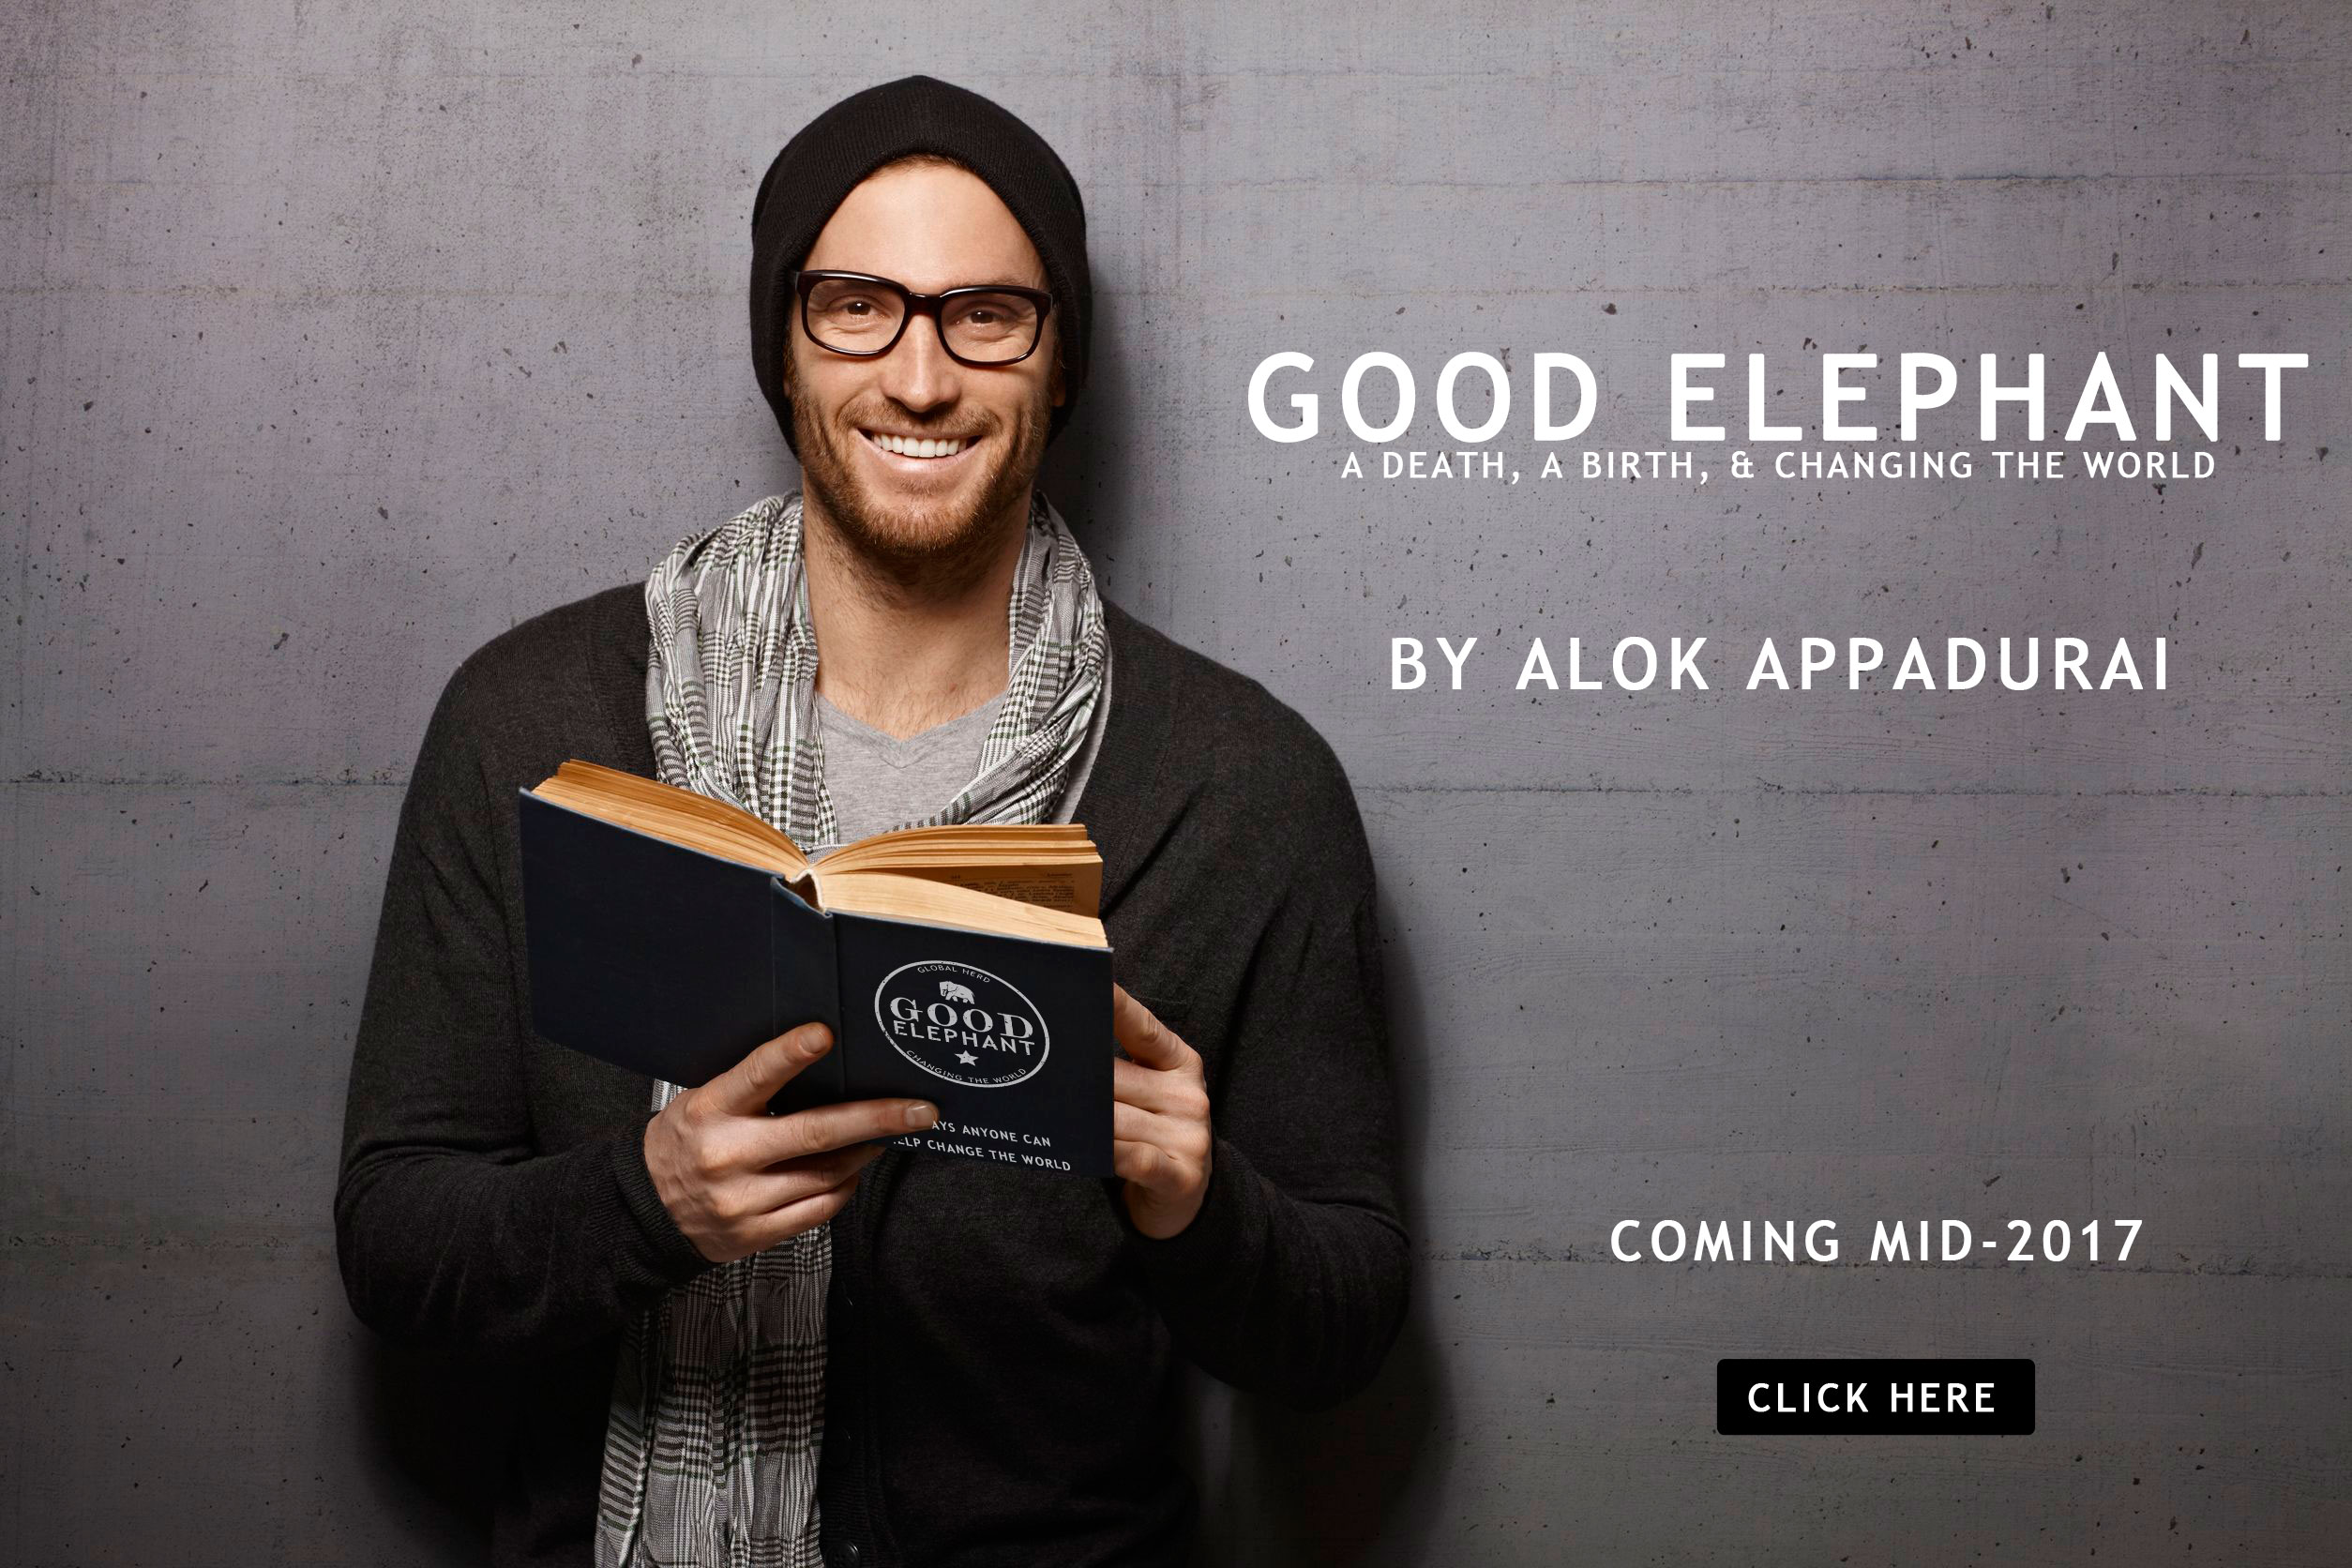 Good Elephant Book by Alok Appadurai